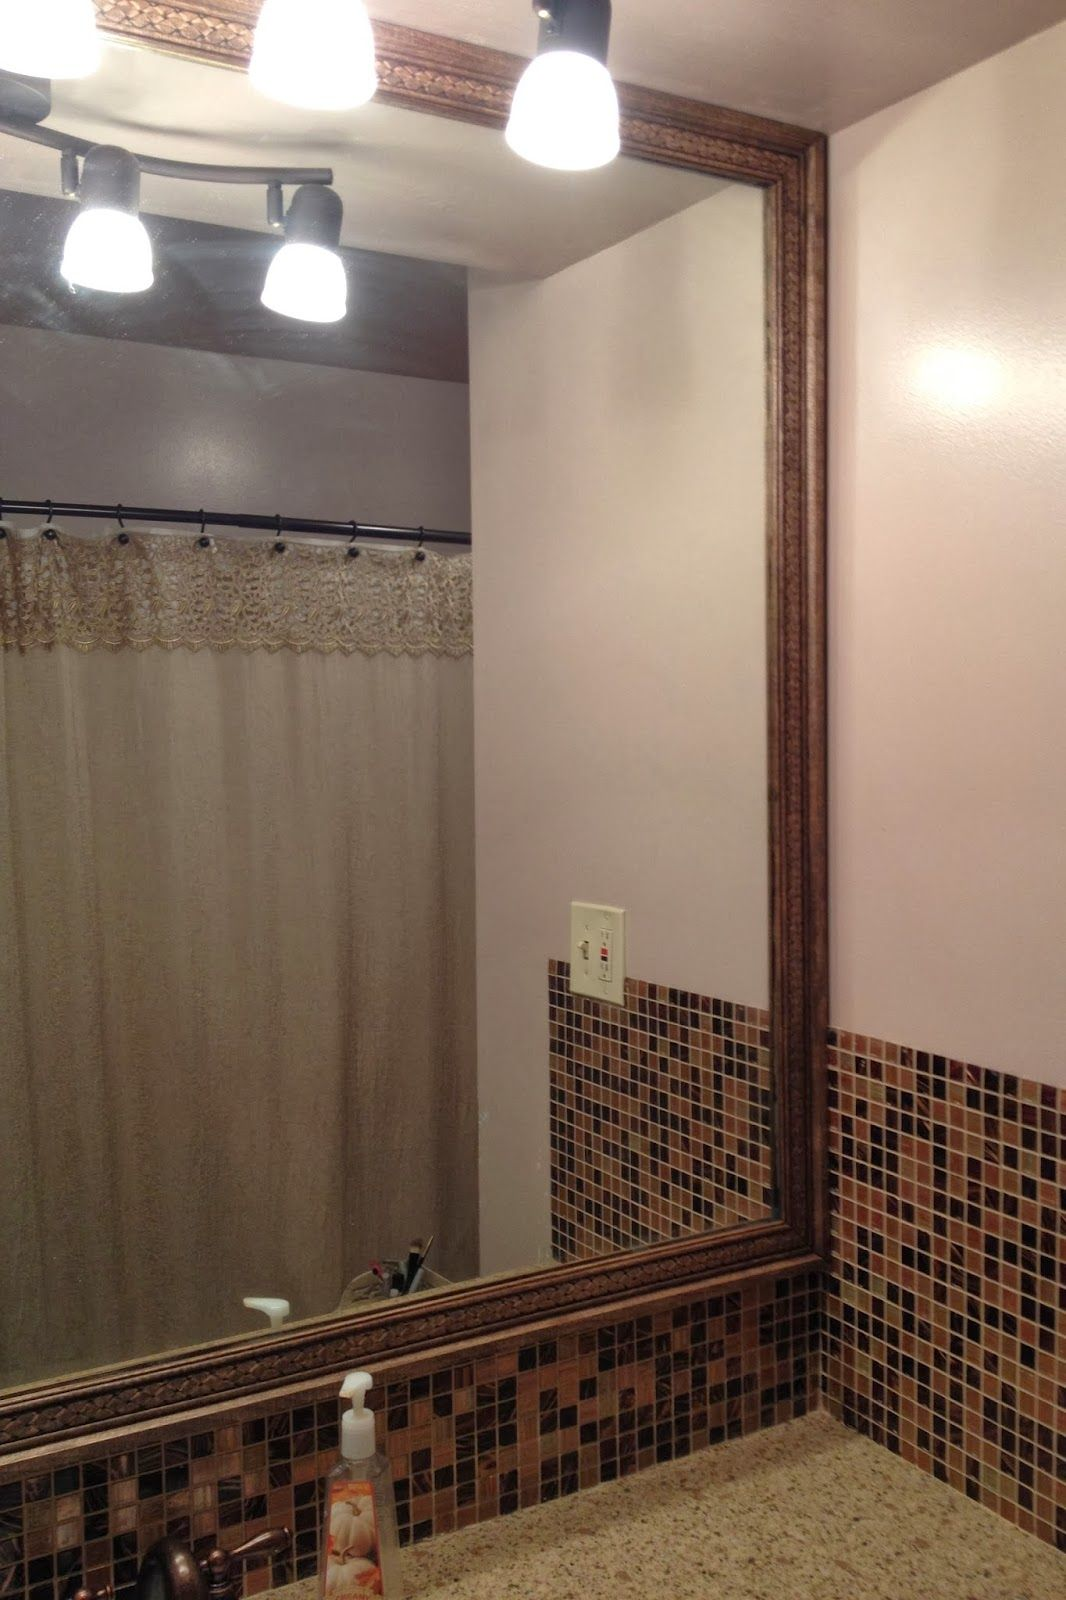 How to add decorative trim to a bathroom mirror ...